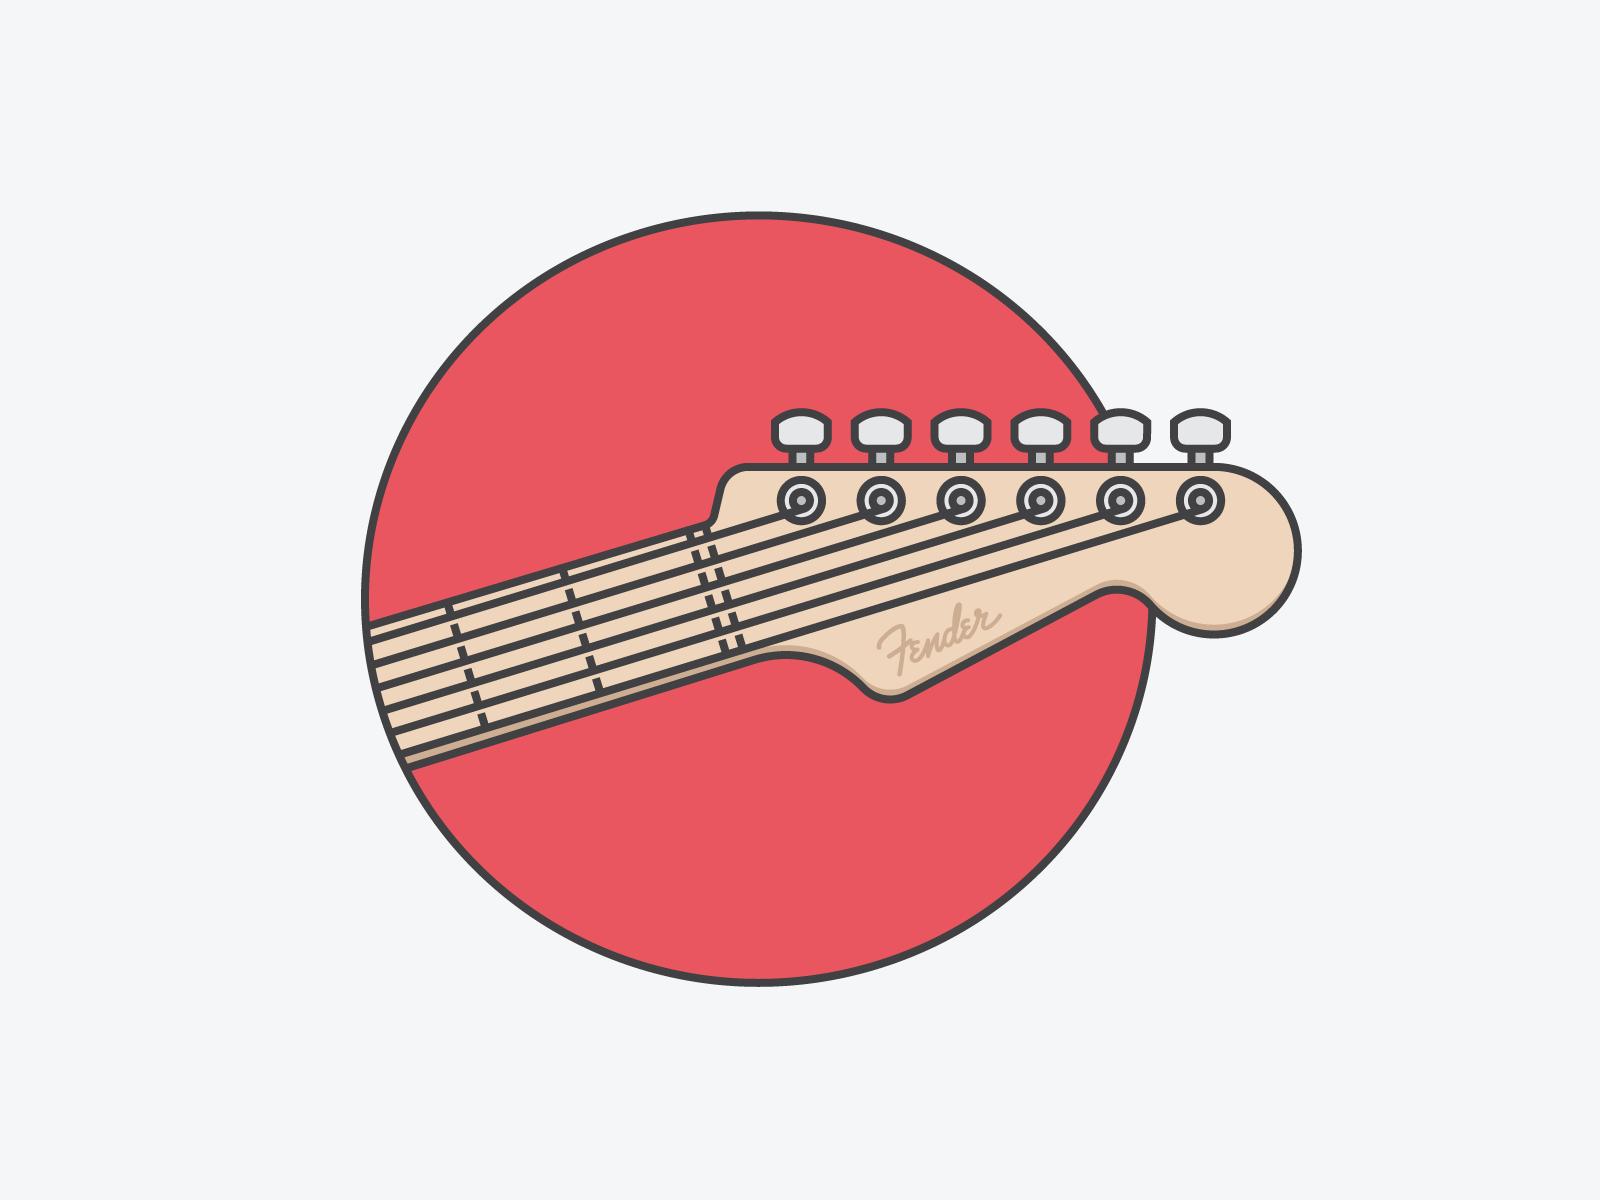 Fender Fullsize Png By Igor Chebotarev Guitar Illustration Music Poster Design Guitar Drawing